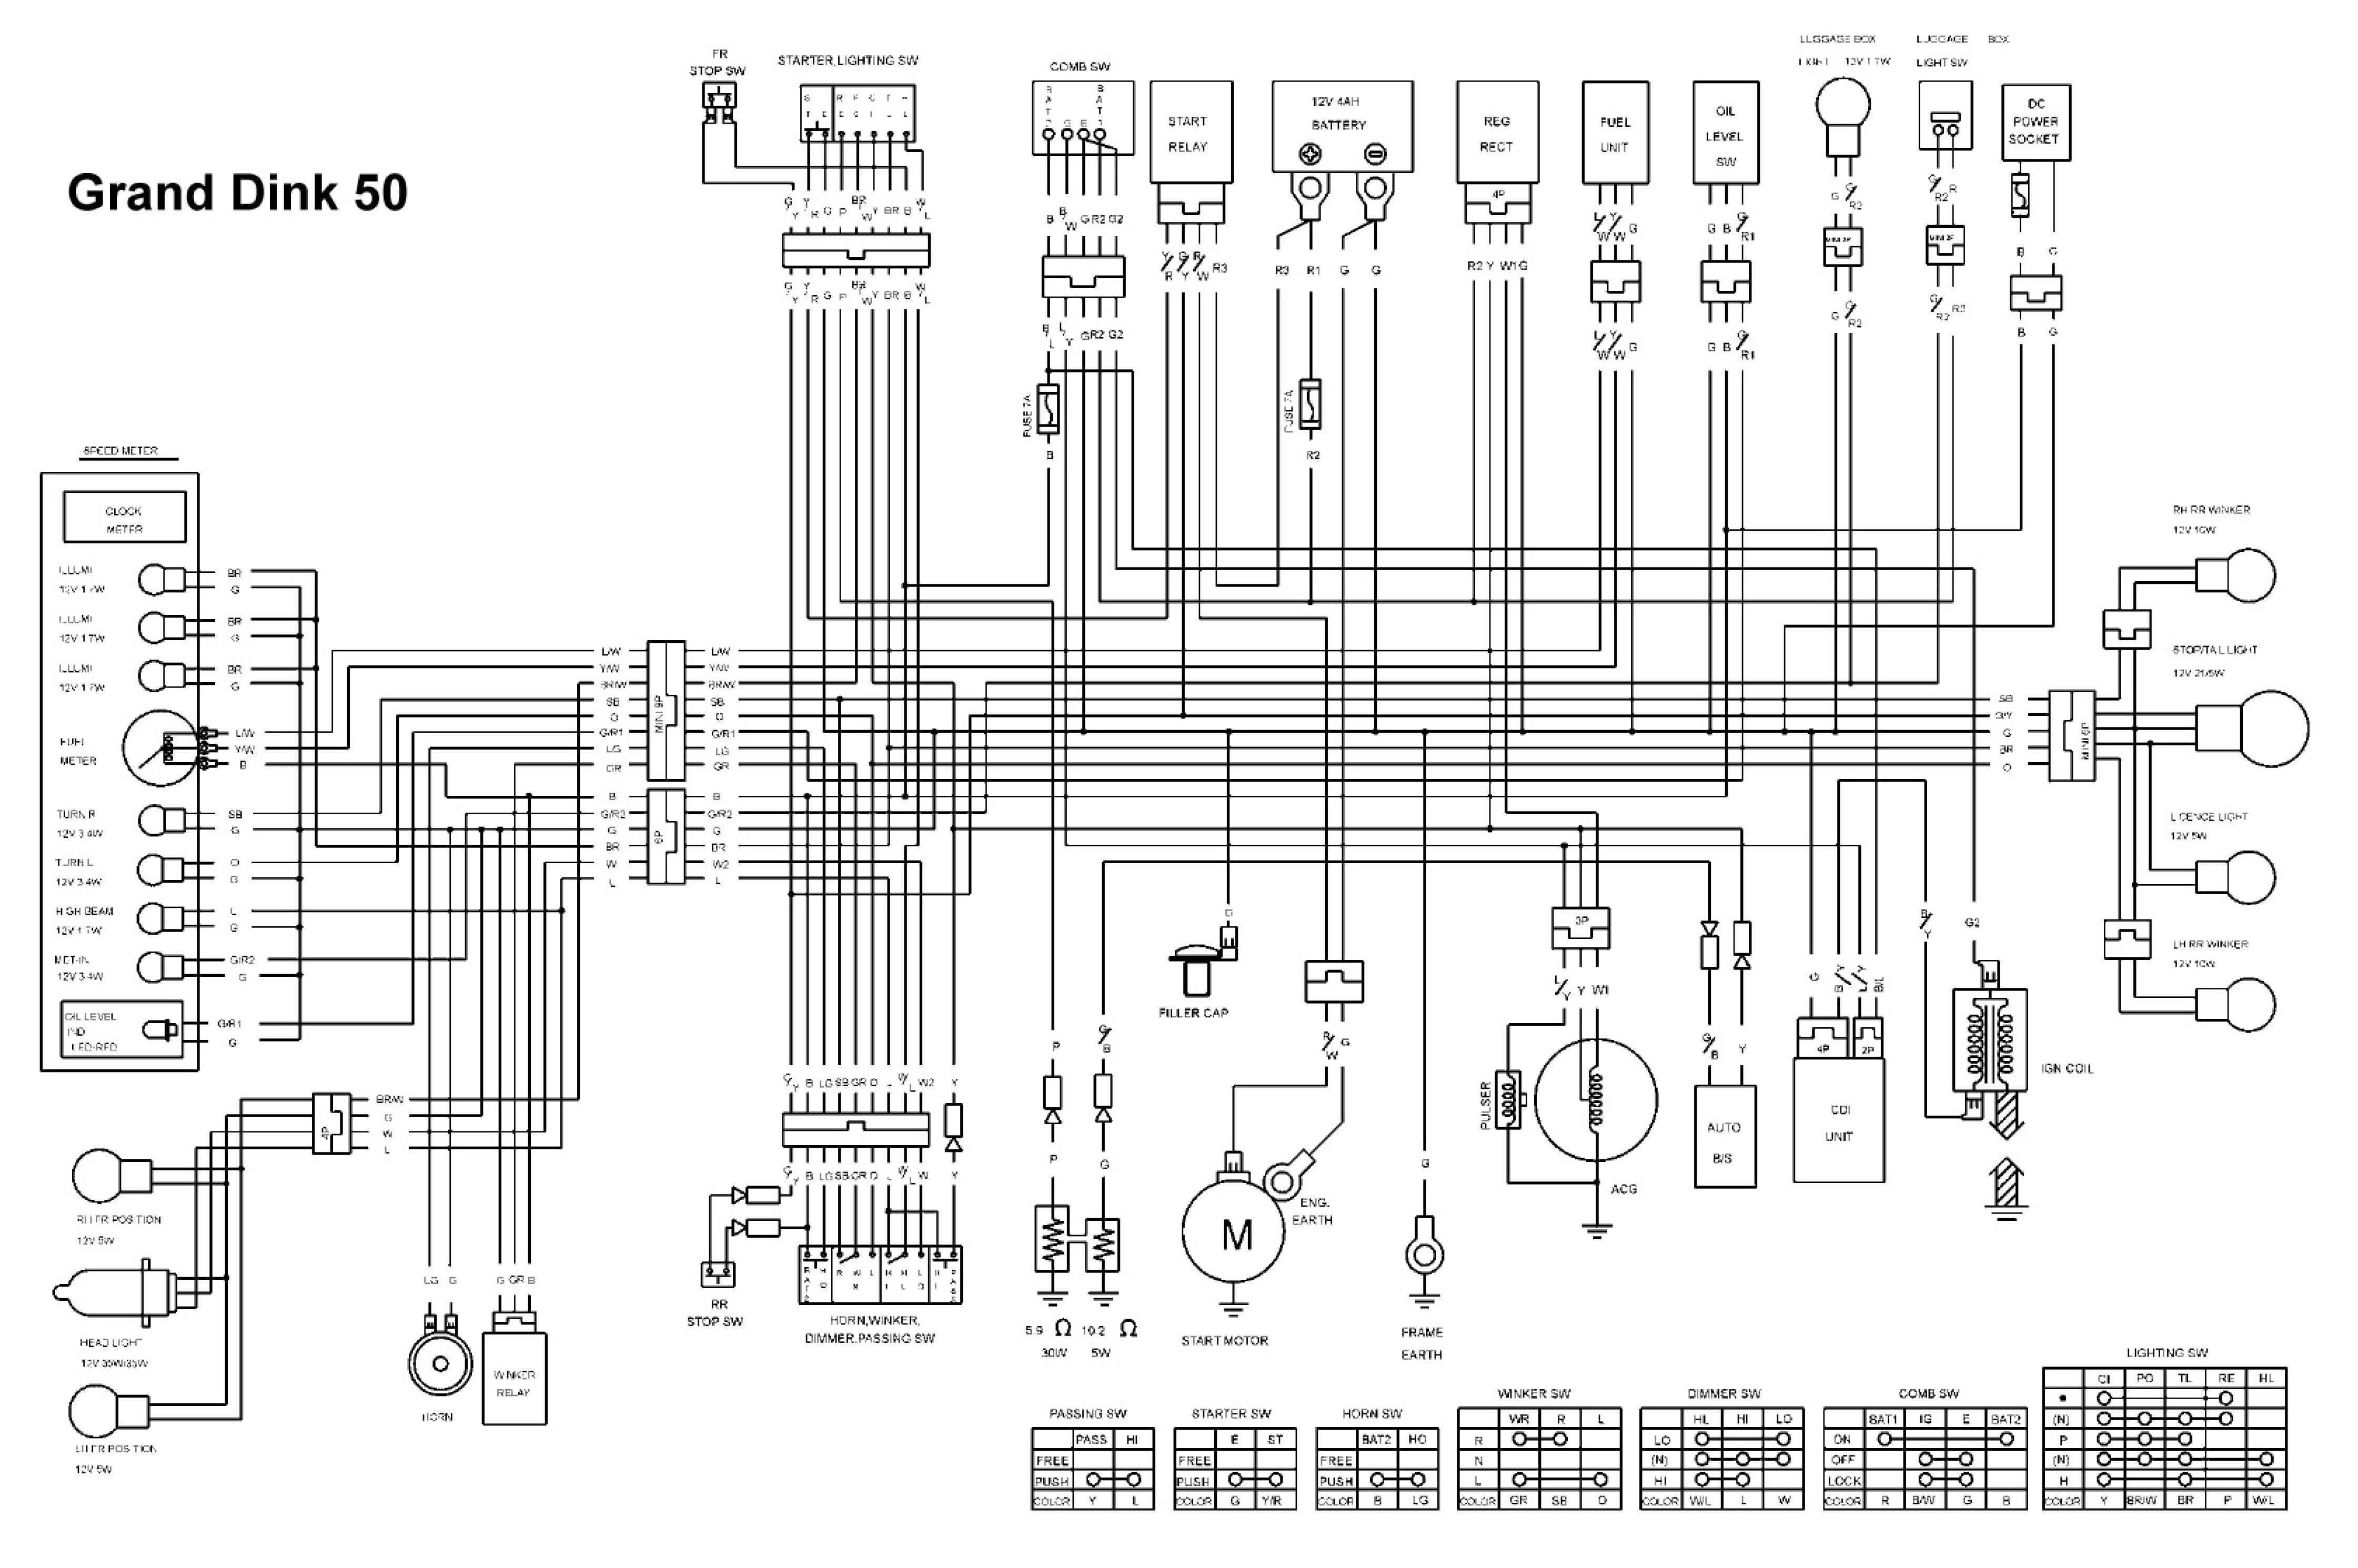 Baja Motorsports Wiring Diagram likewise Xr 400 Engine Diagram moreover Zongshen Wiring Diagram furthermore 86 Cc Loncin Atv Wiring Diagram moreover Pit Bike  26 Honda 50 2F70 Engine size. on chinese dirt bike wiring diagram